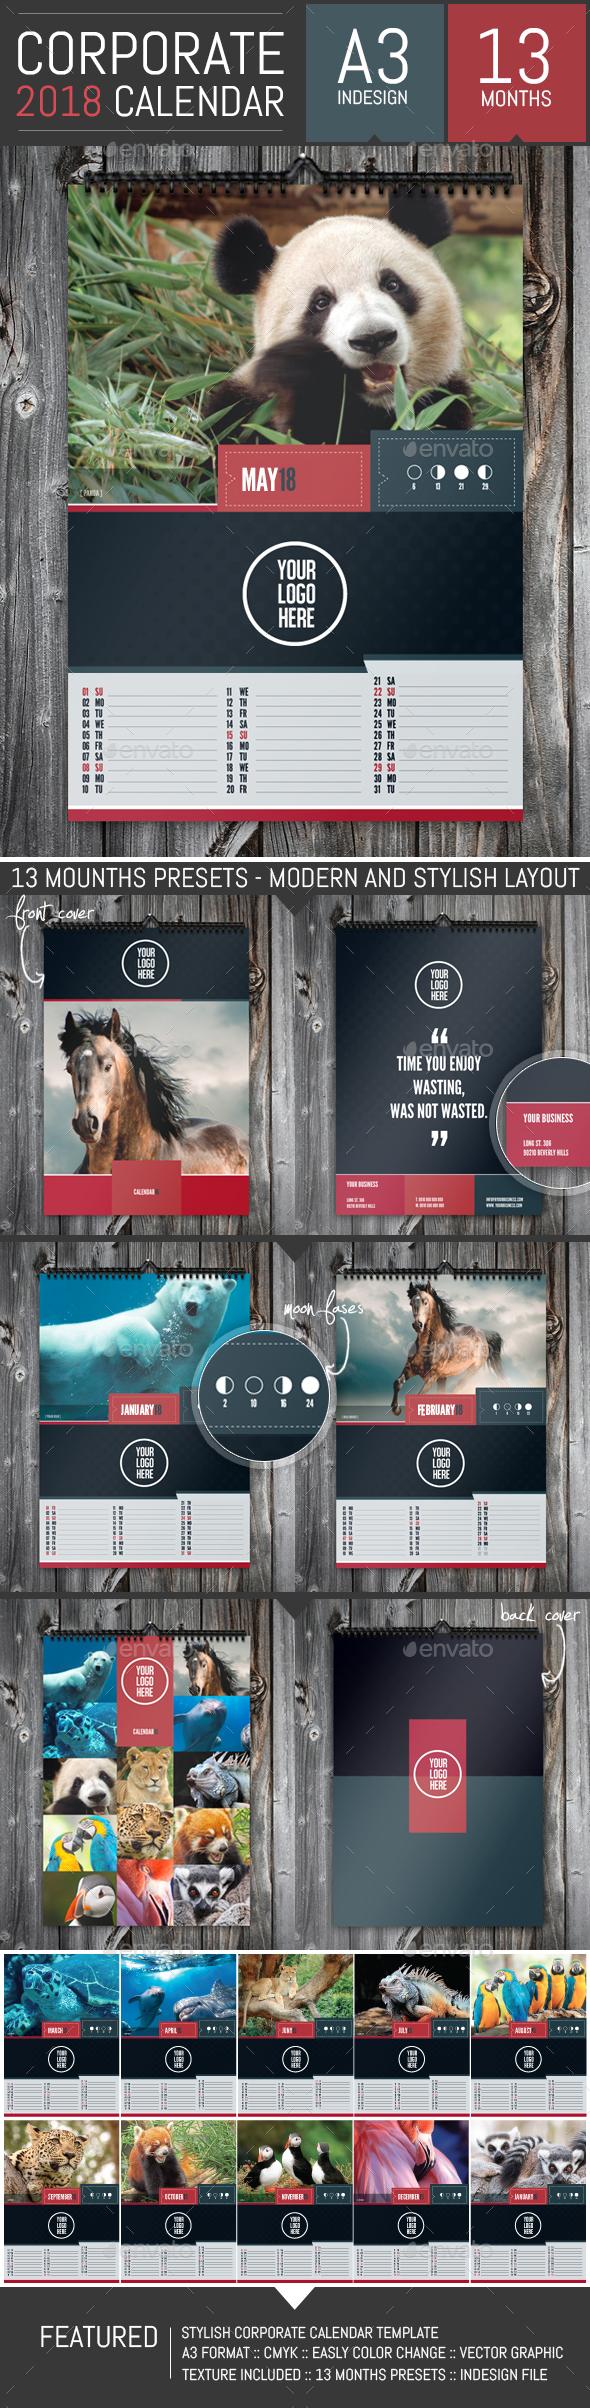 Stylish Corporate 2018 Calendar Template - Calendars Stationery